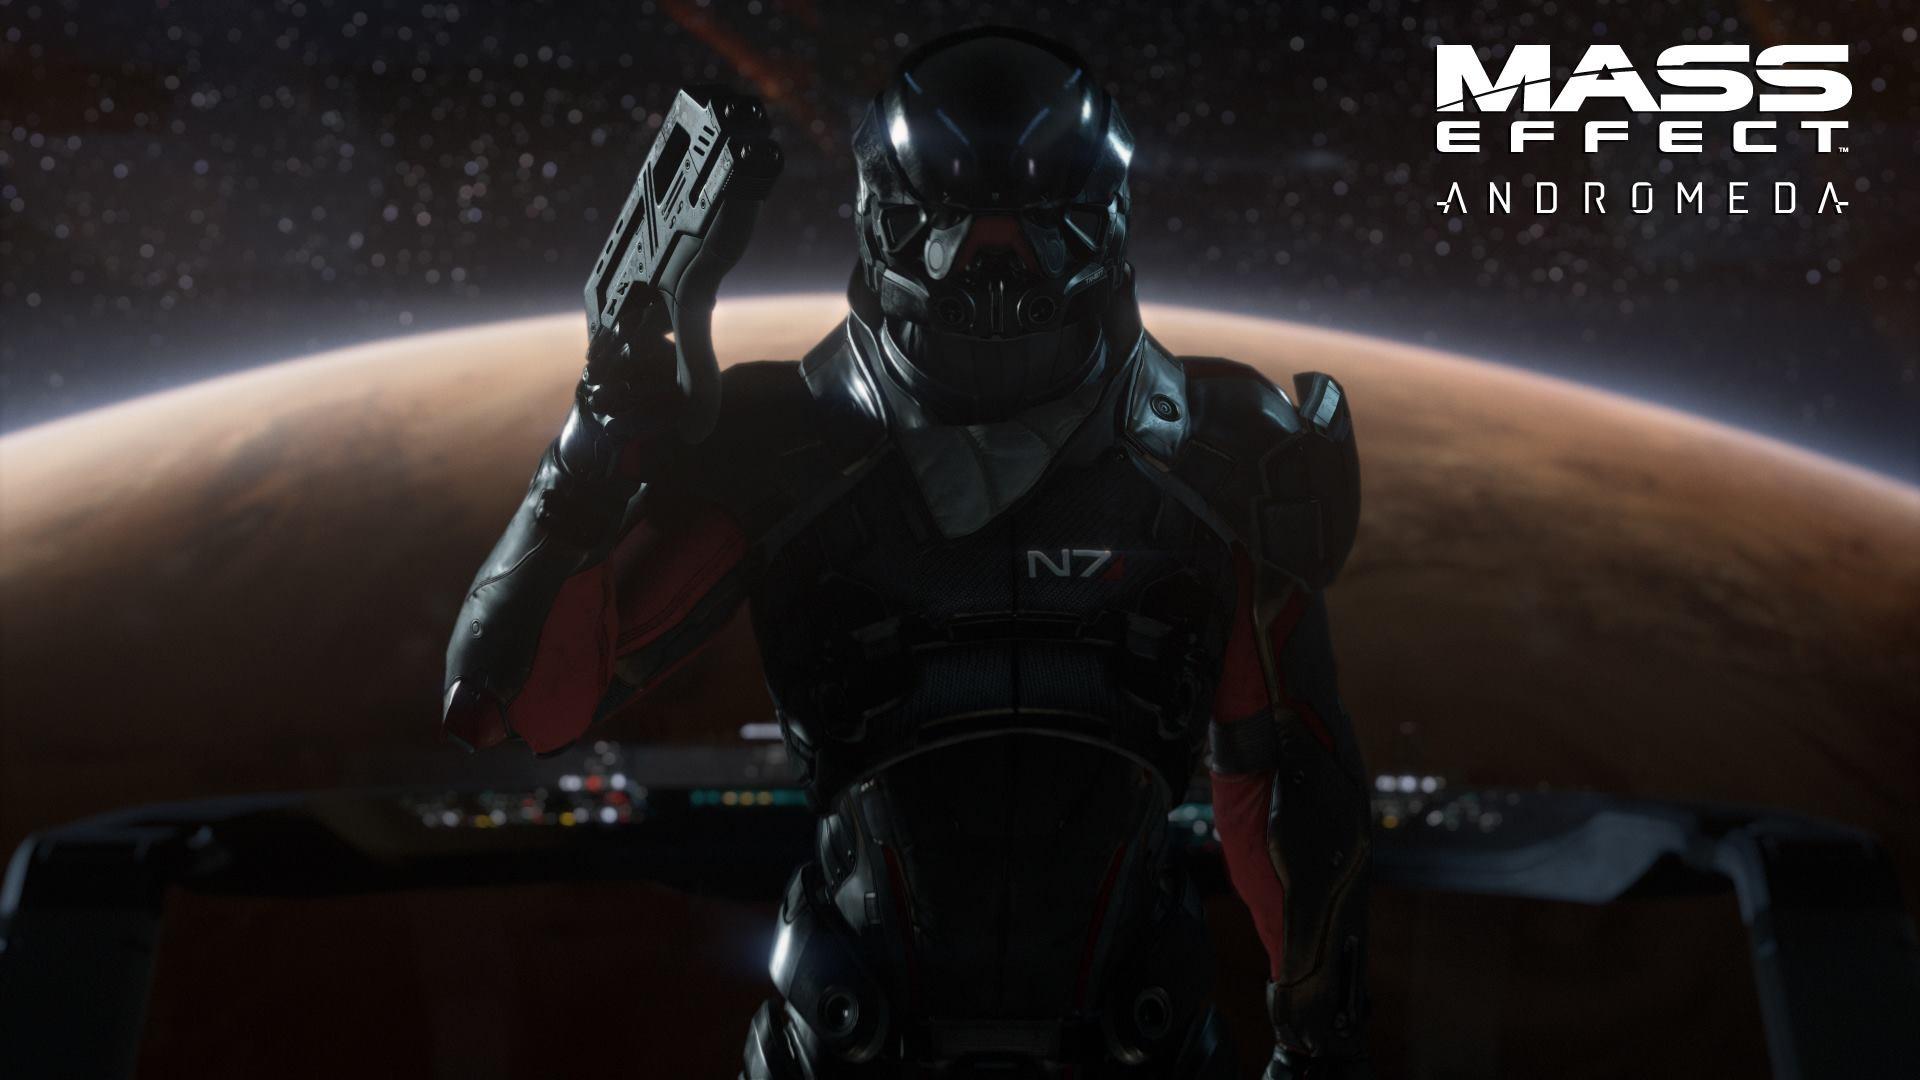 General 1920x1080 Mass Effect Mass Effect 4 Mass Effect: Andromeda N7